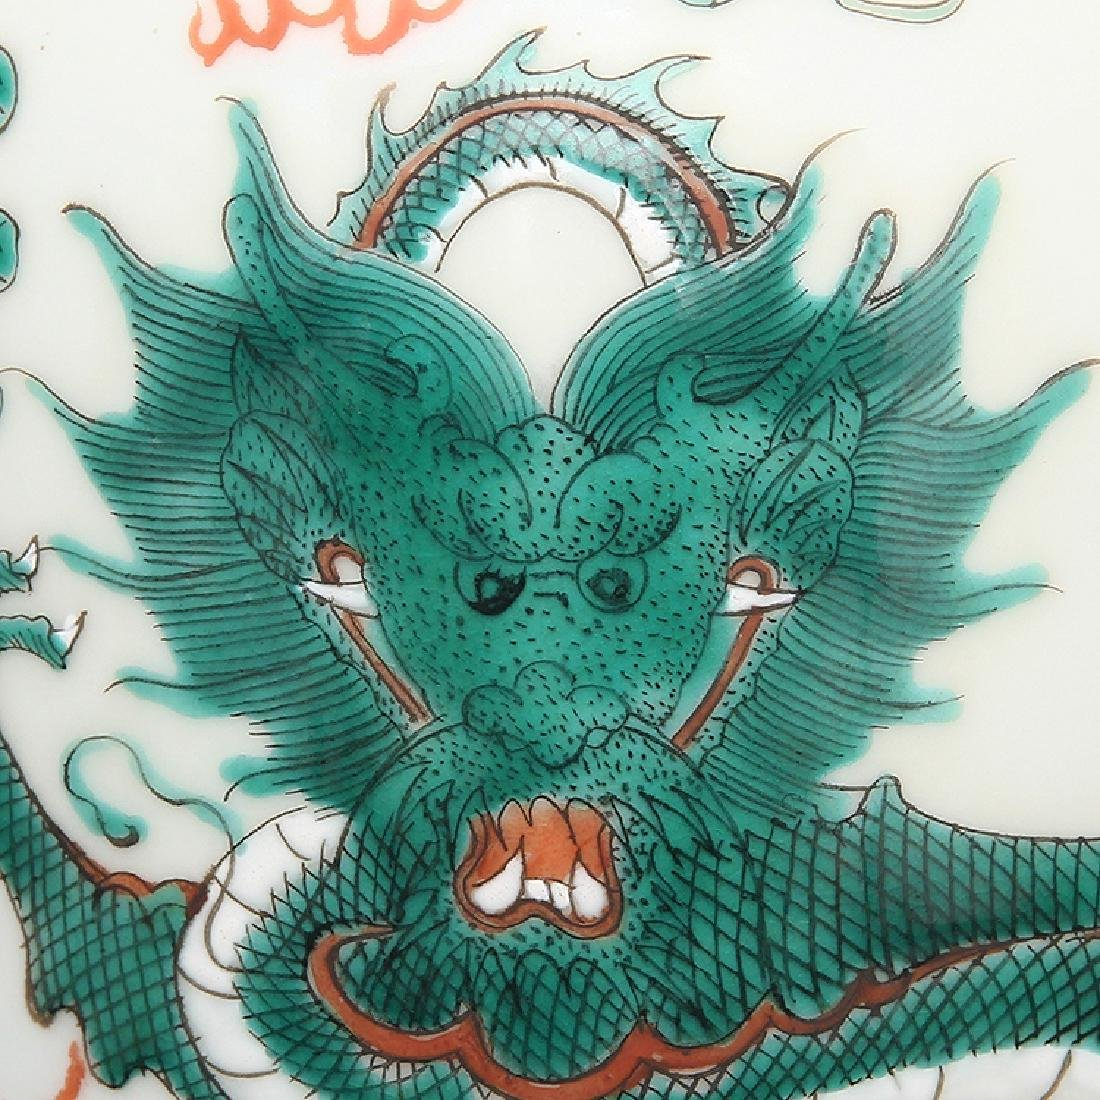 Chinese White Glaze Green Dragon Porcelain  Vase - 2